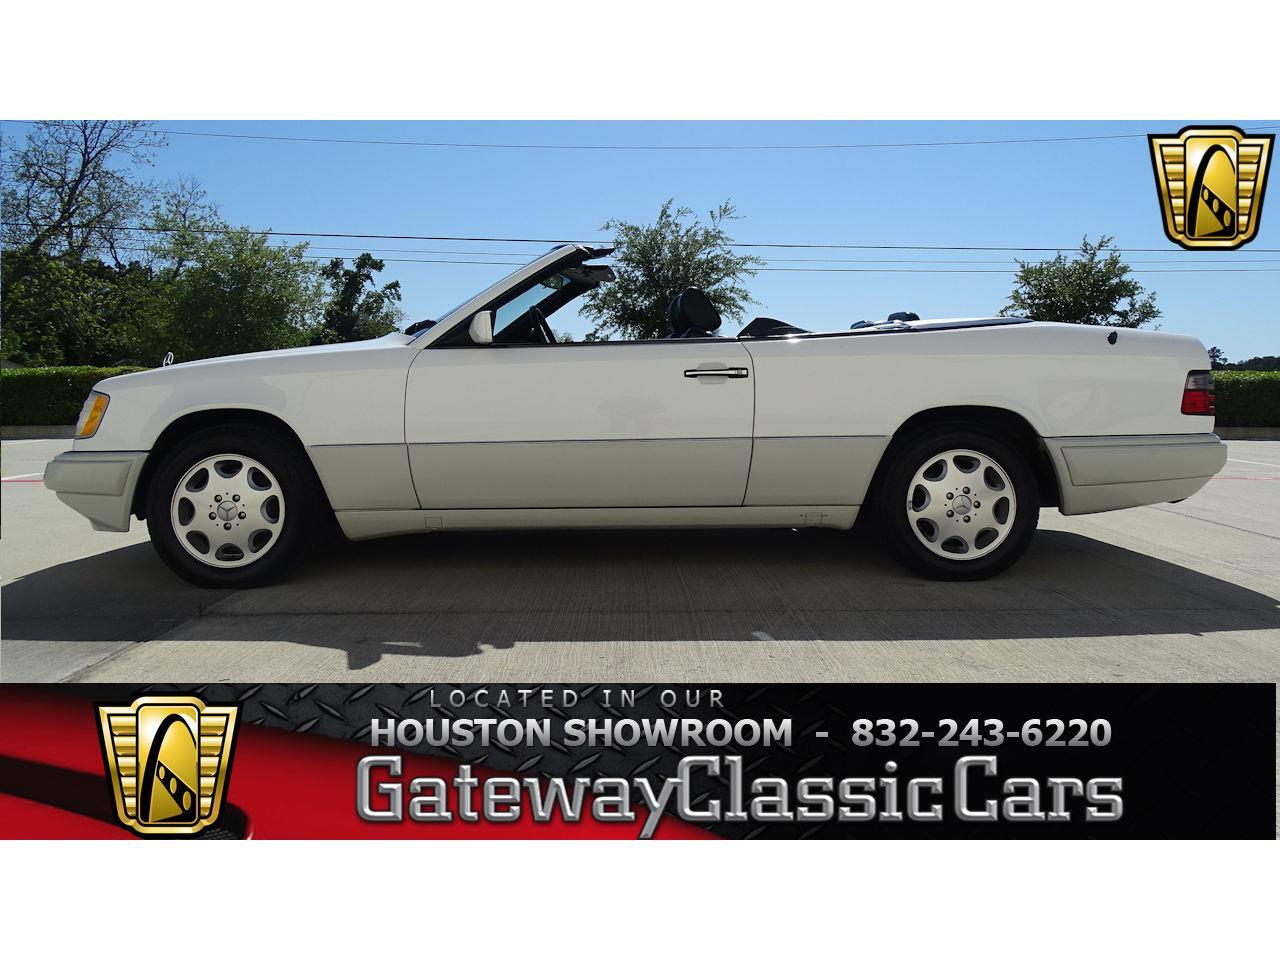 For Sale: 1995 Mercedes Benz E320 In Houston, Texas